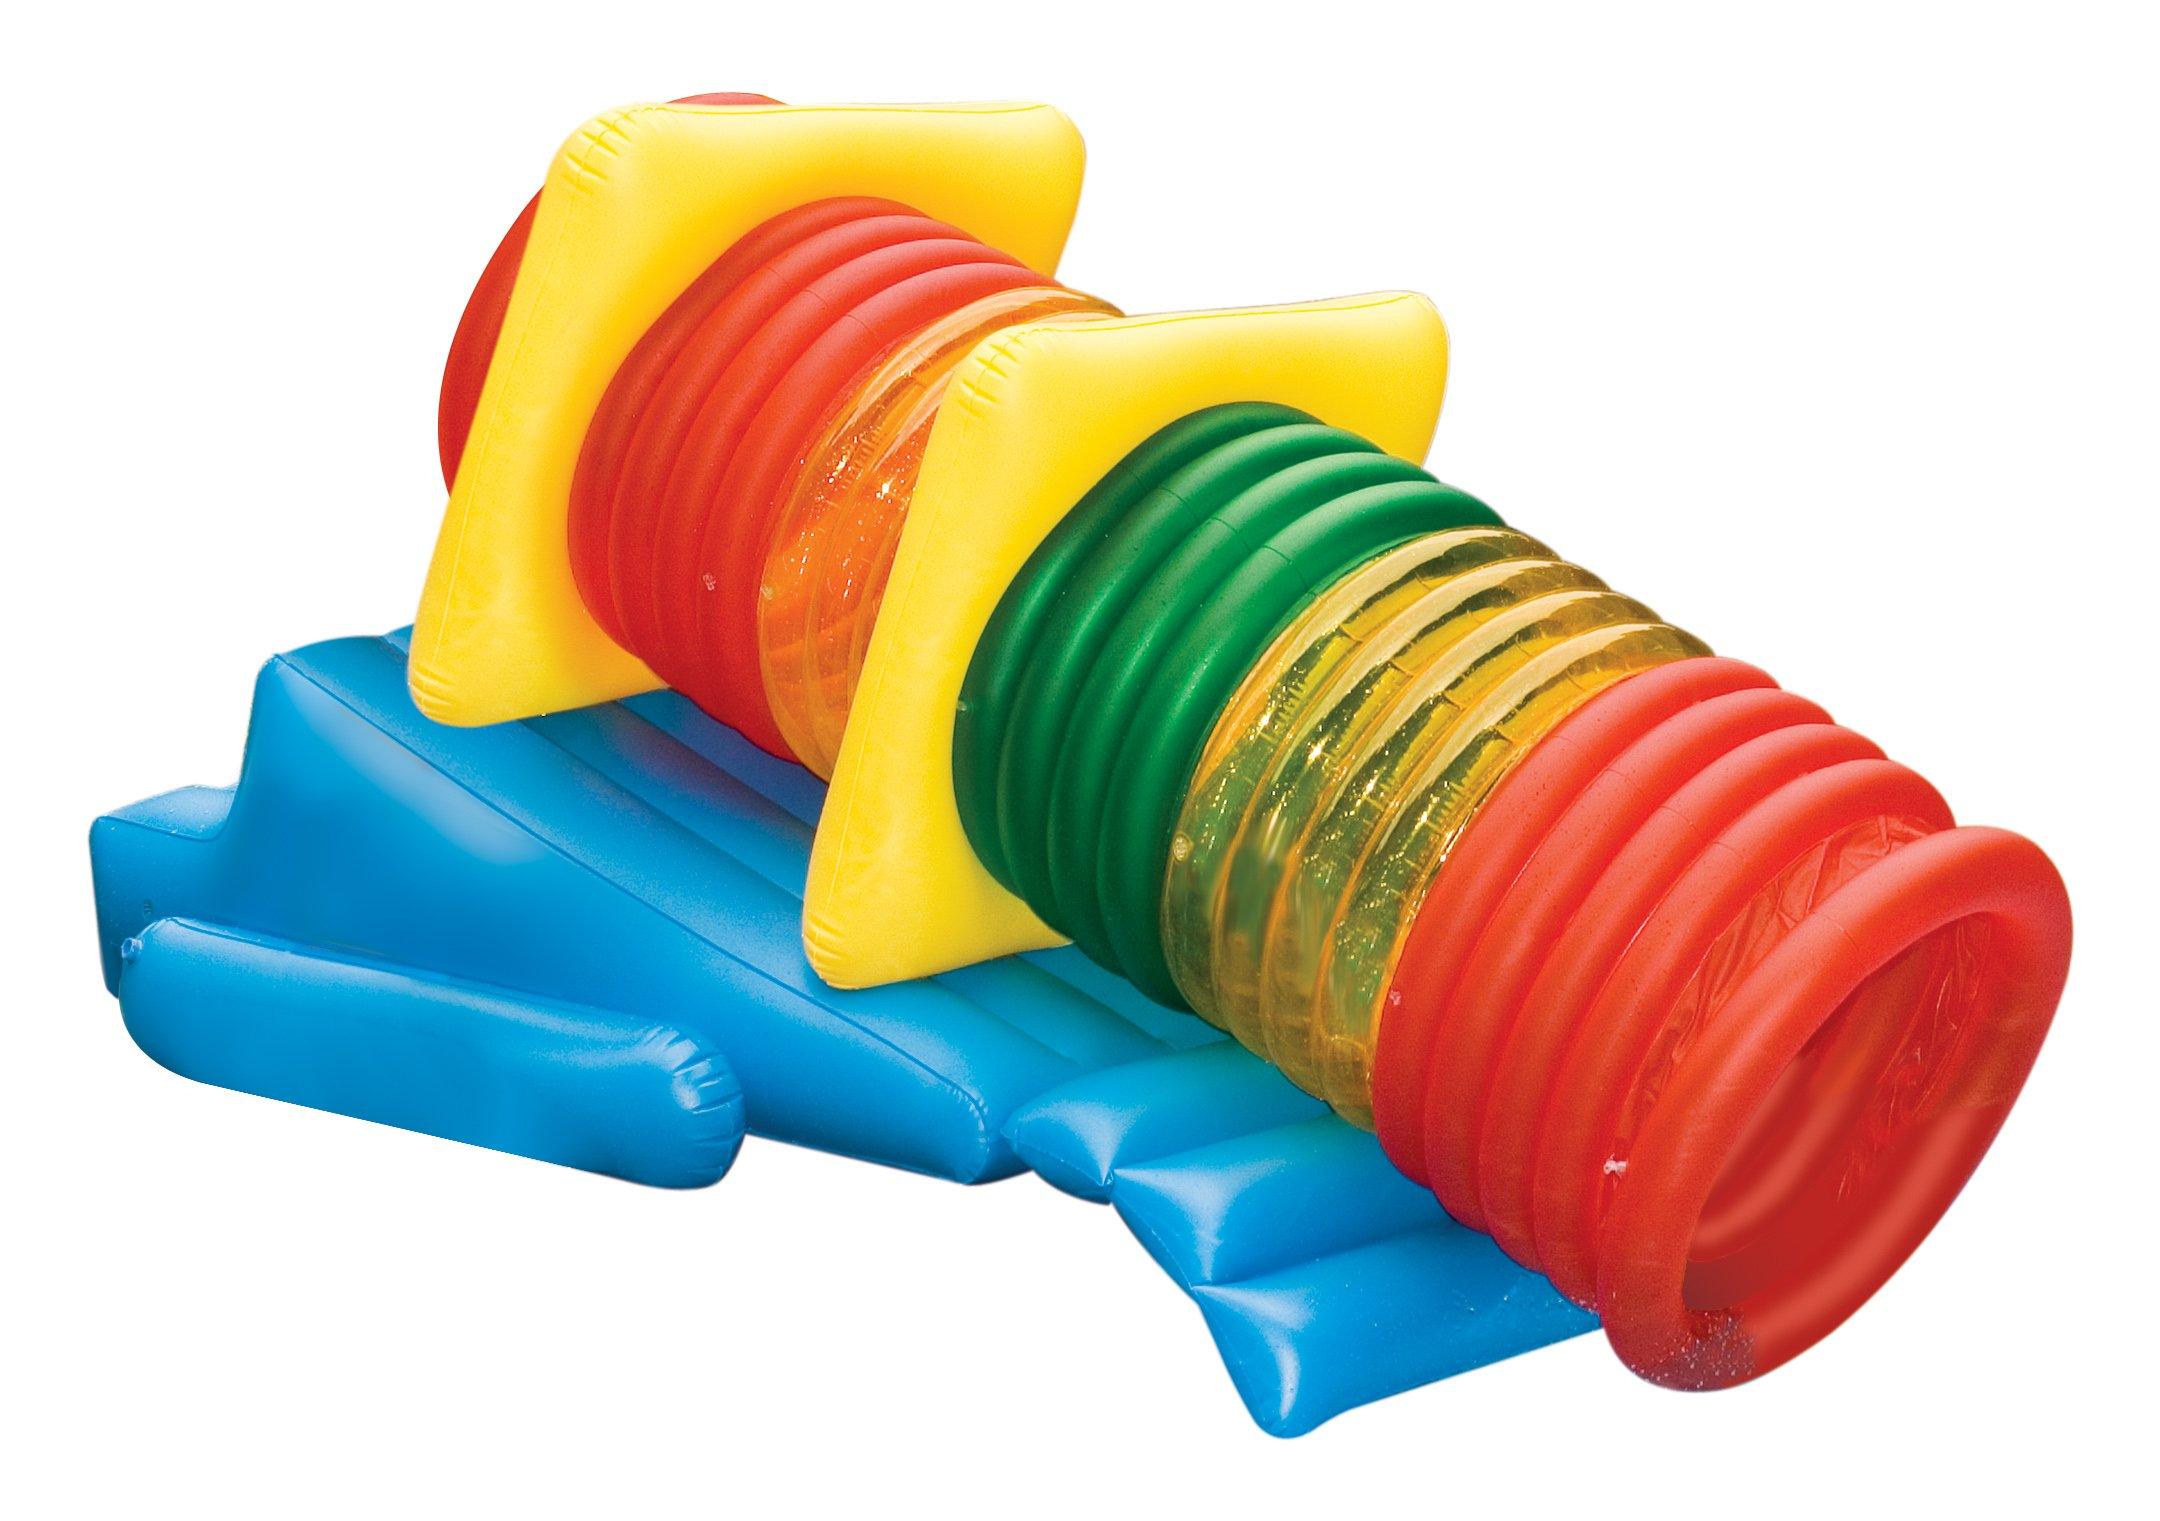 Swimline Water Park Inflatable Pool Slide by Swimline (Image #1)